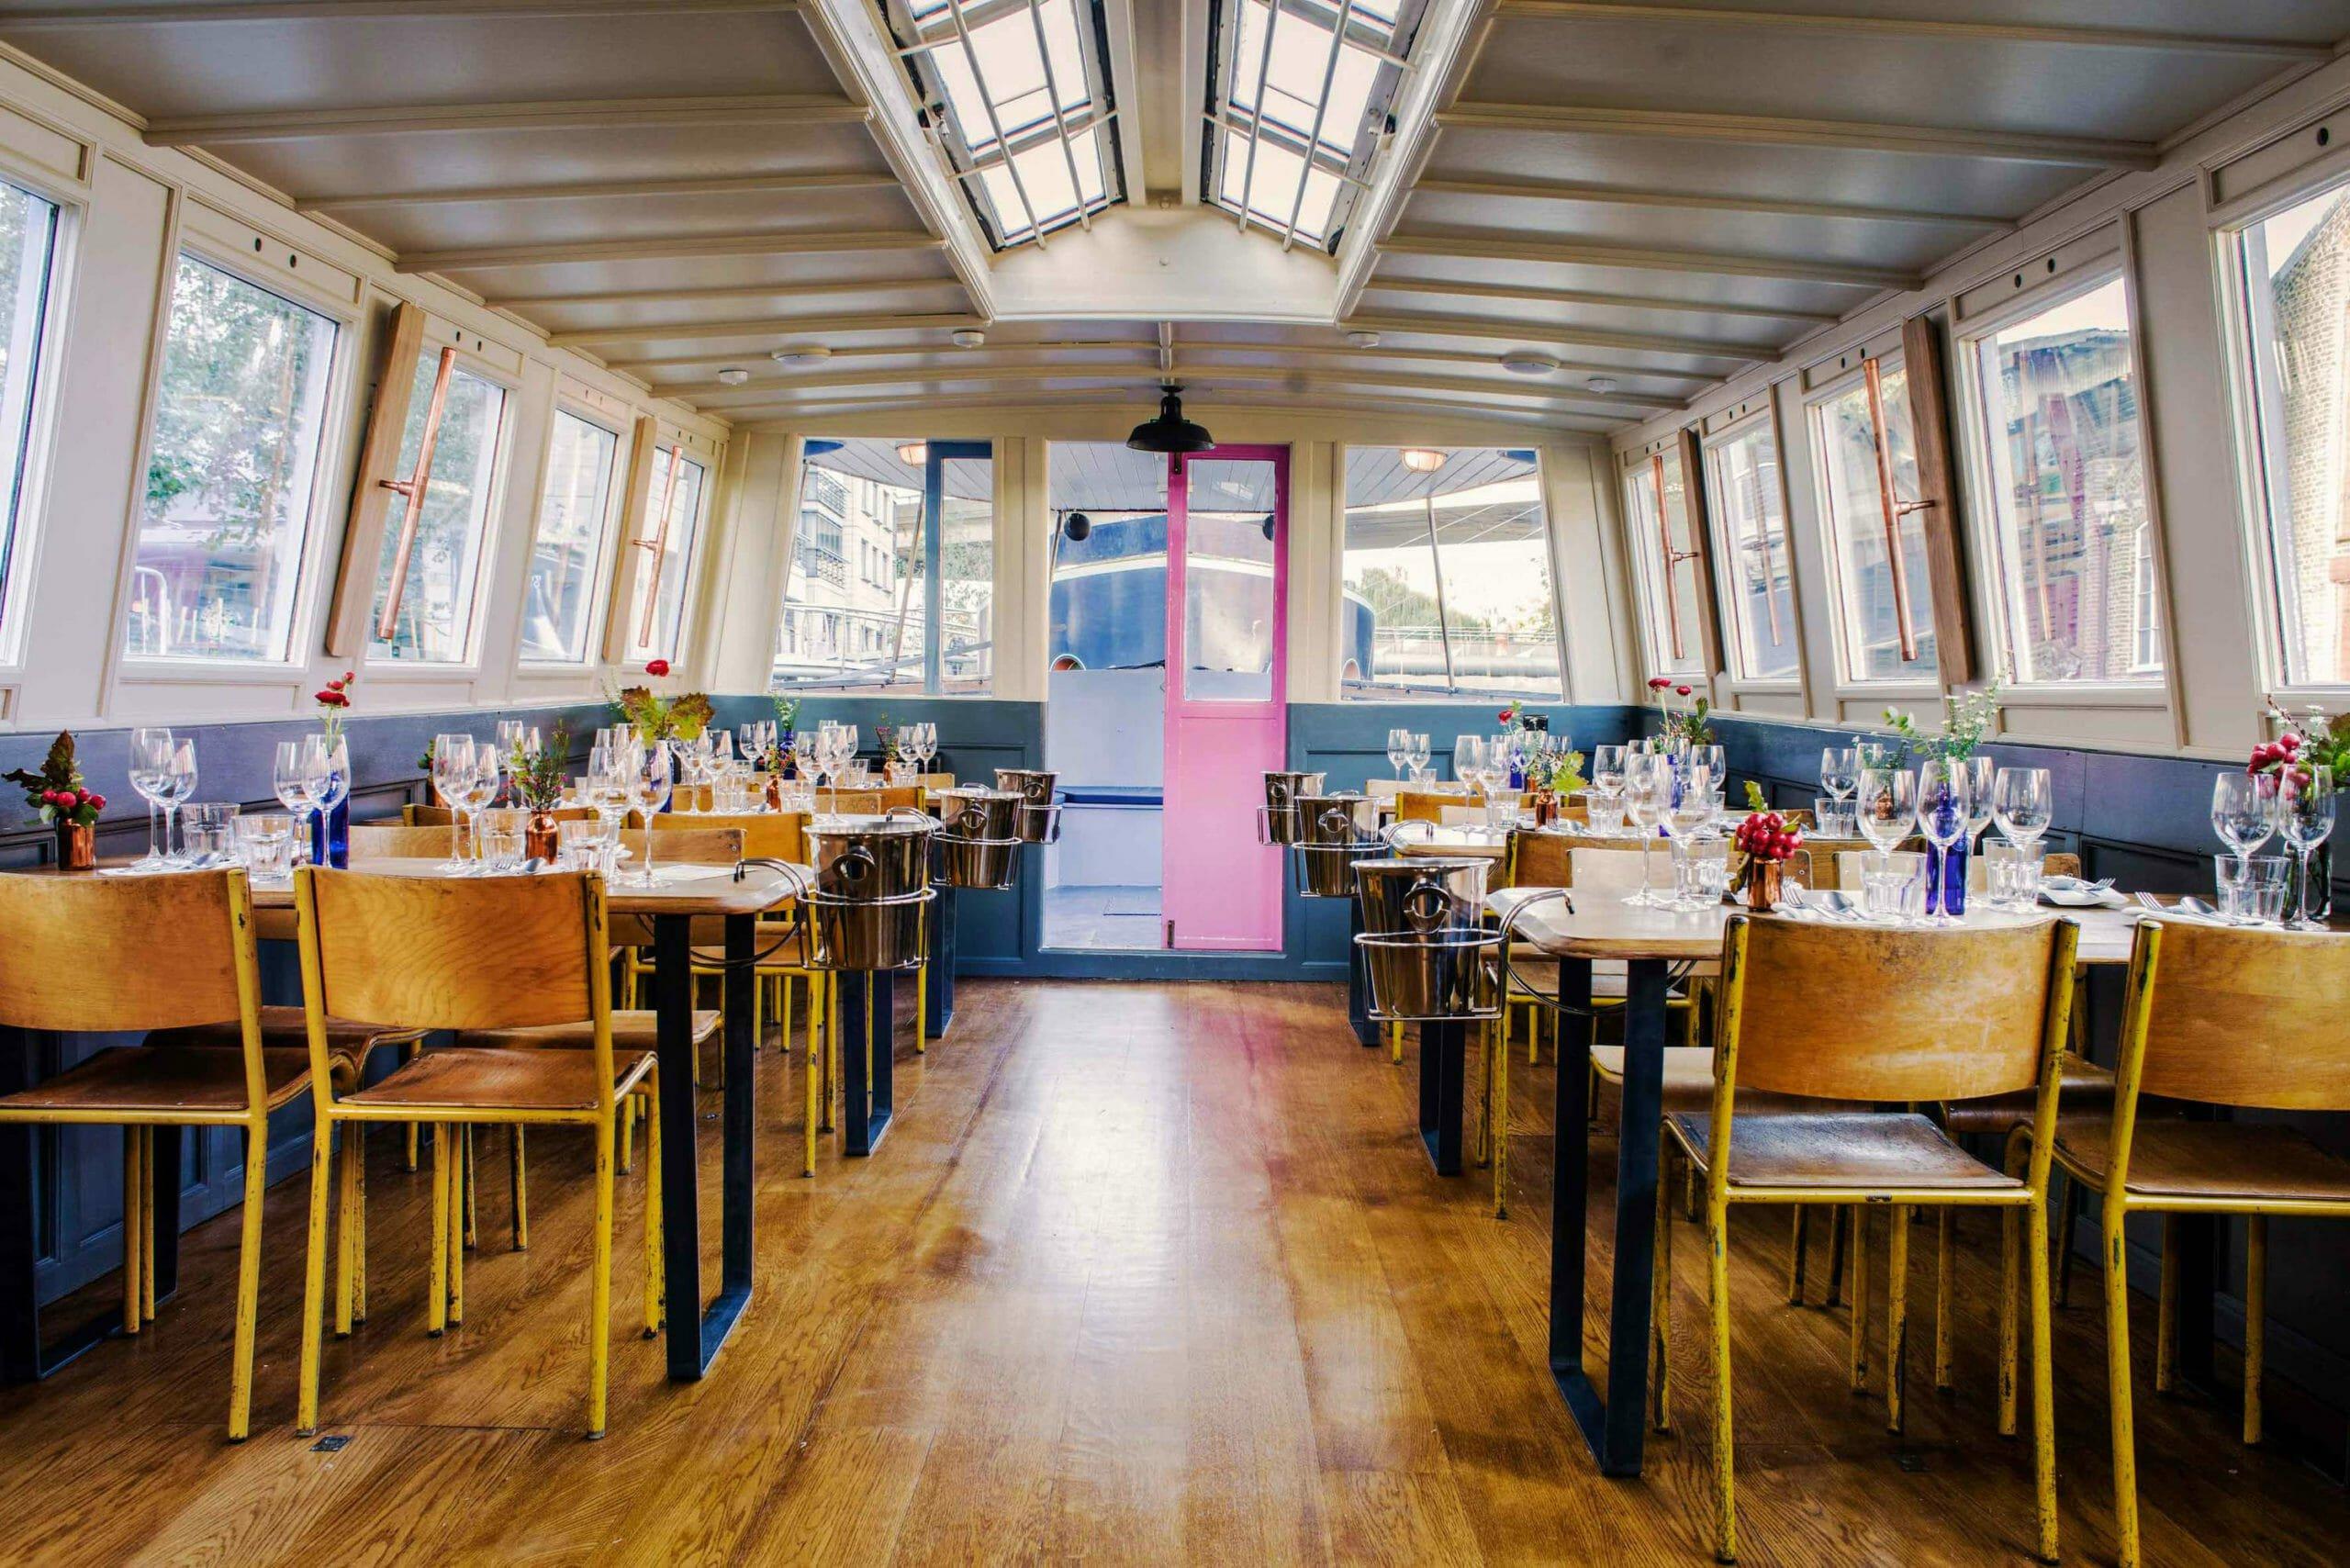 Romantic restaurants: London Shell Co.